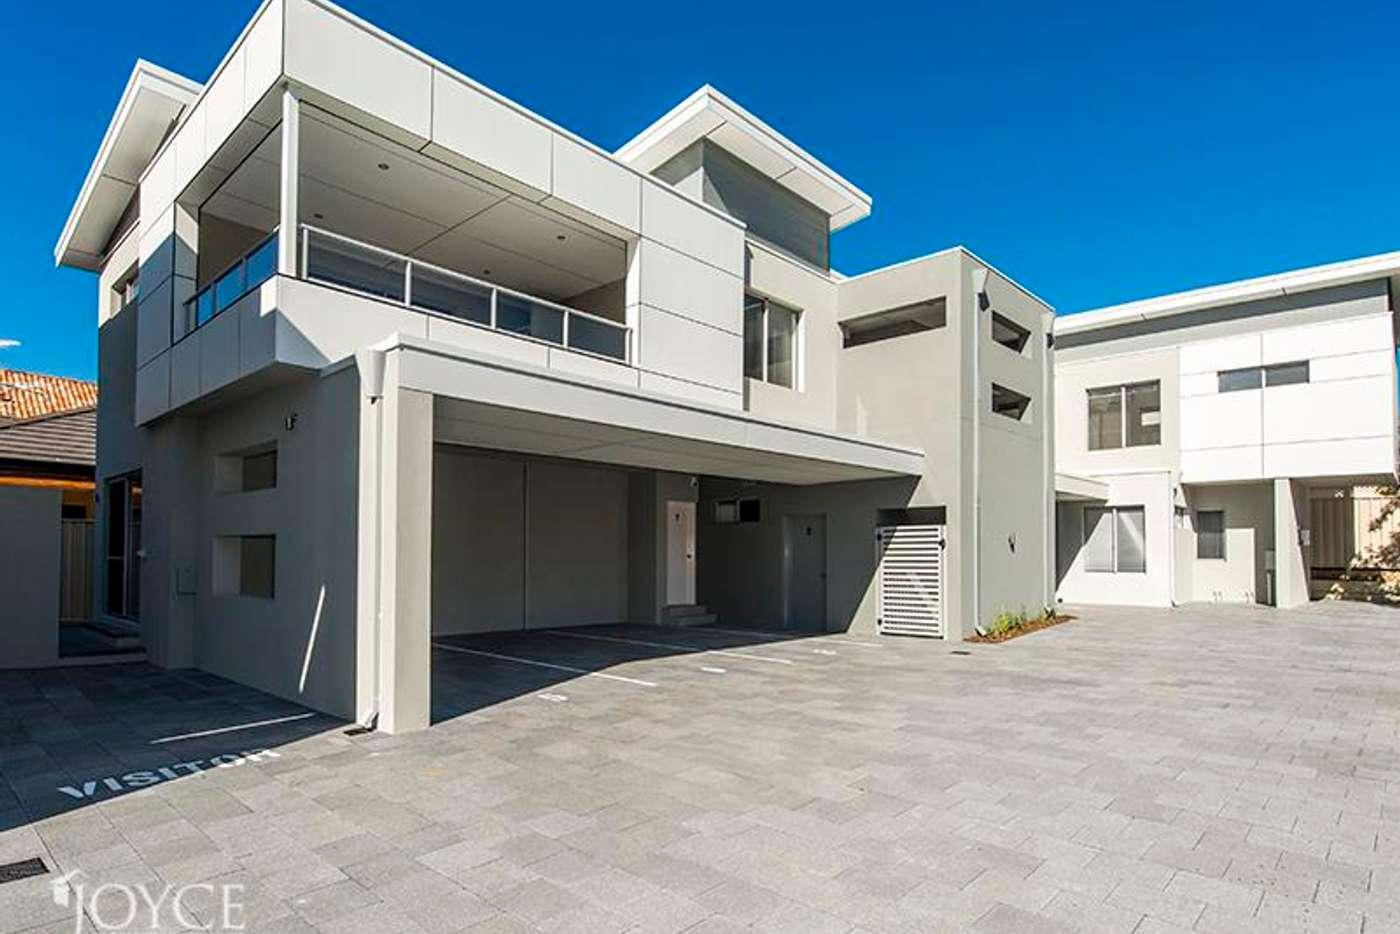 Main view of Homely apartment listing, 2/88 Joondanna Drive, Joondanna WA 6060